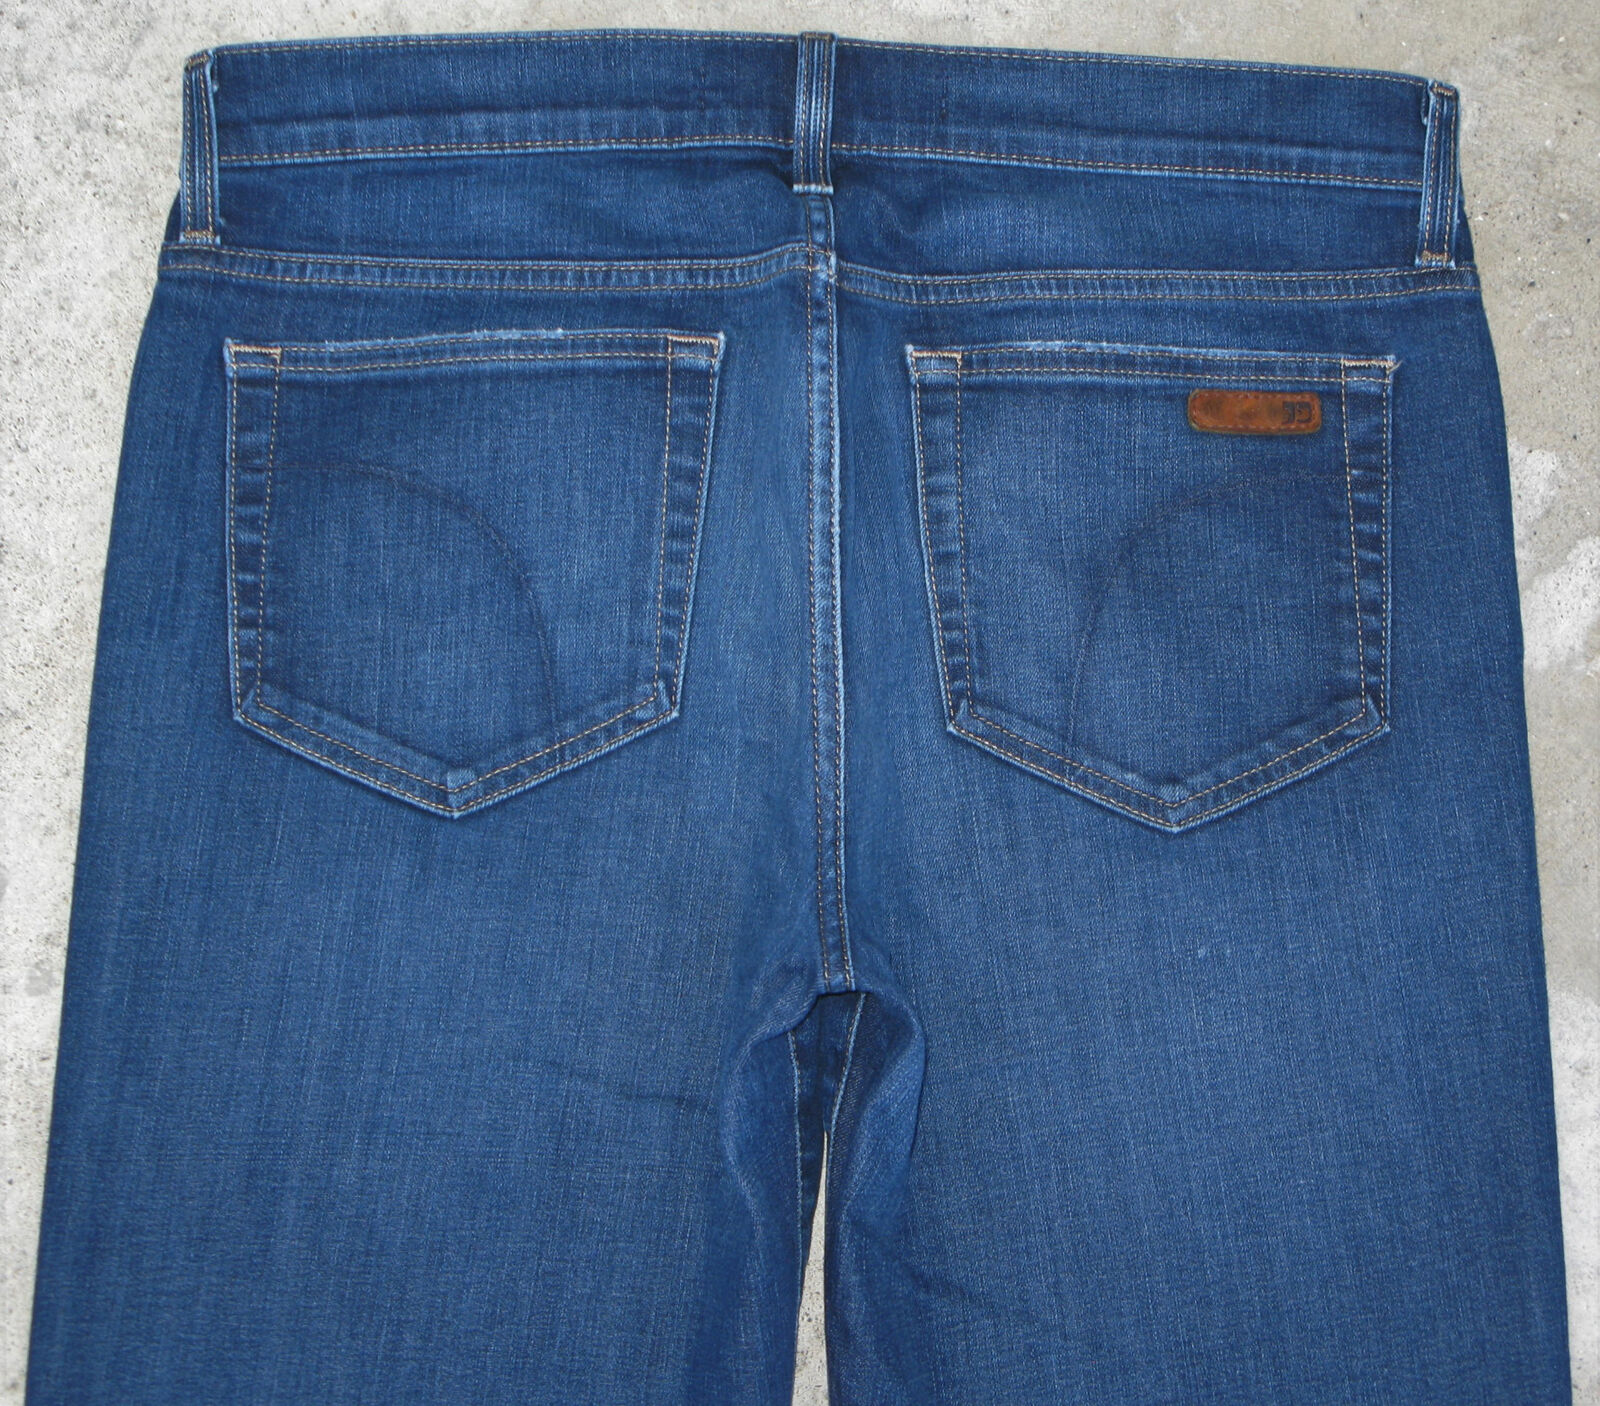 J0E's Mens Classic Straight Leg Jeans Sz 32 x 33  Stretchy Distressed Wash